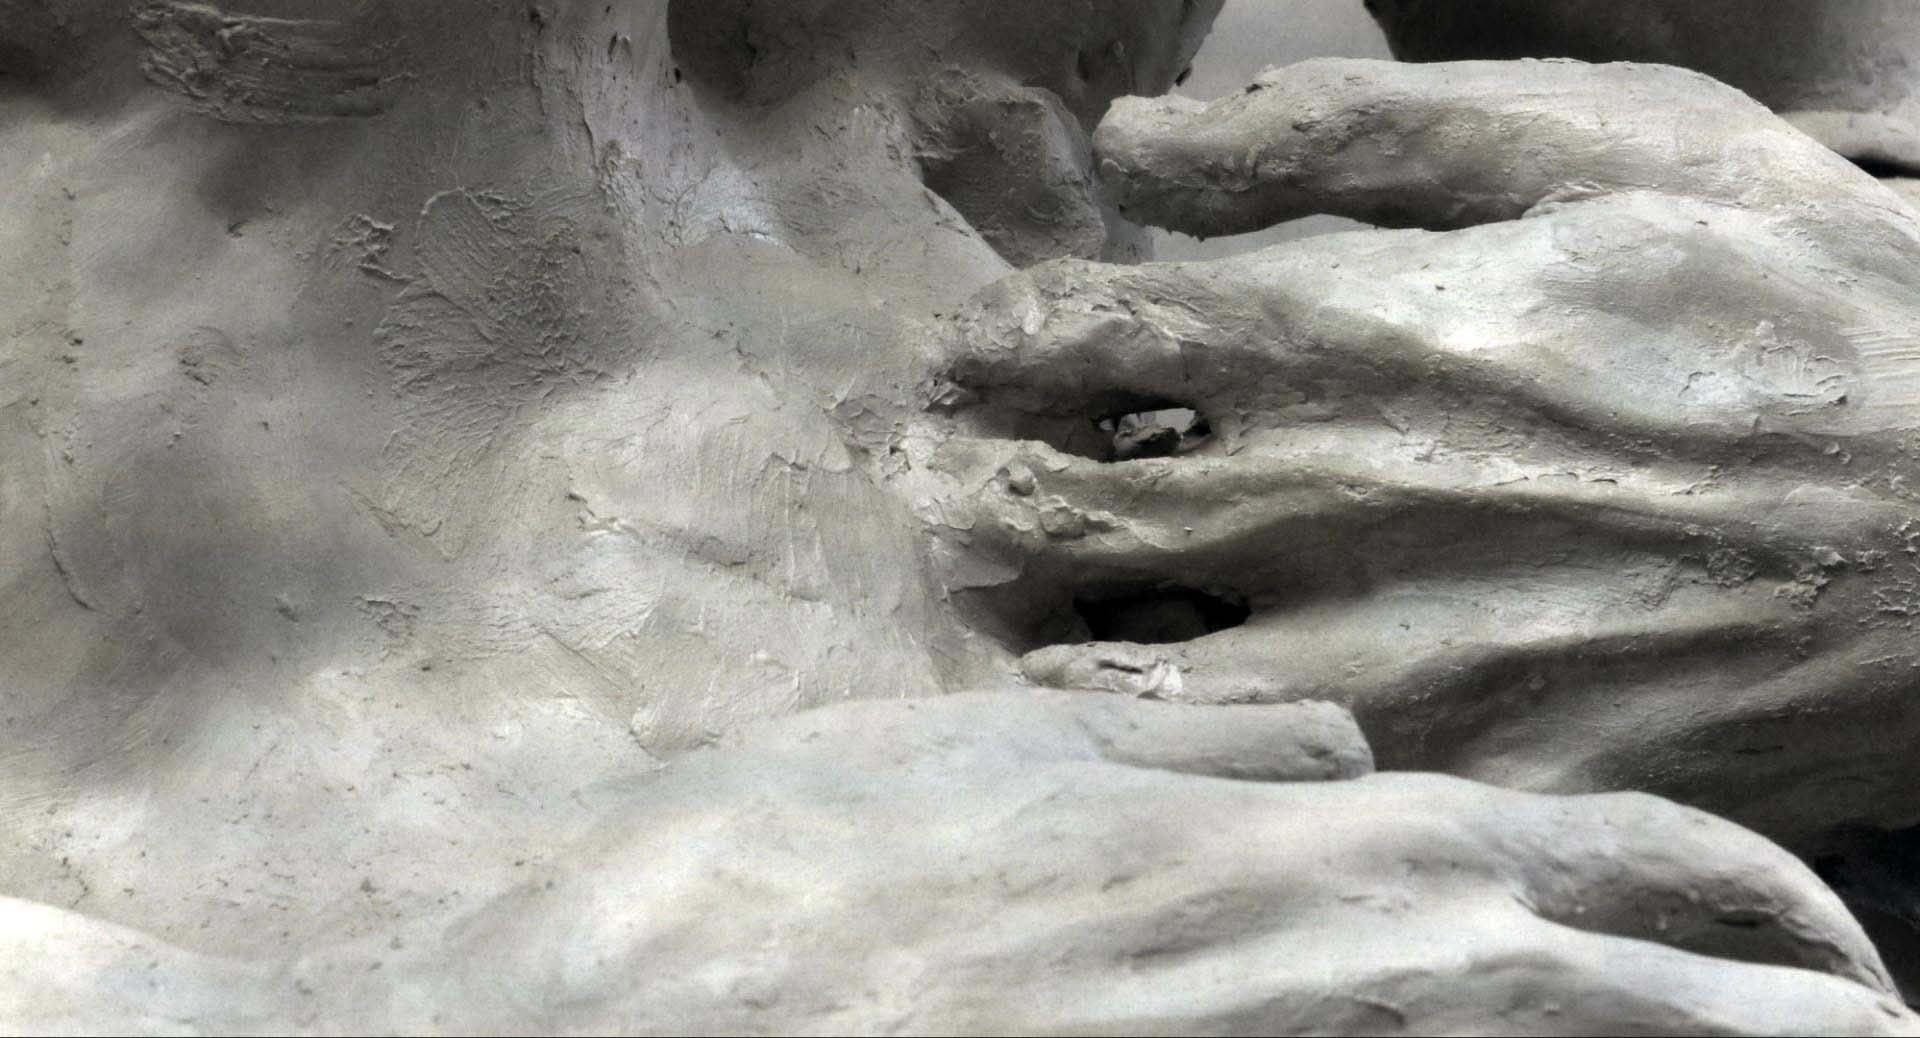 - 作品名称:《泥土和油墨》导演:乔纳森·拉斯卡尔制片:埃利·沙皮伊国家/地区:瑞士创作时间:2013 编剧:乔纳森·拉斯卡尔美术:乔纳森·拉斯卡尔音乐:皮埃尔·丰克片长:4分40秒Title: From Earth and Ink (De Terre et D'encre)Director: Jonathan LaskarProducer(s): Elie ChapuisCountry/Area: Switzerland Year of production: 2013 Screenplay: Jonathan Laskar Design: Jonathan Laskar Music: Pierre Funck Length: 4 mins 40 secs作品介绍本片描述了一个男子利用粘土制作另一个自己的故事。这个活生生的肖像体现了他在那段关系中自己身体遭遇的痛苦。Synopsis This is the picture of a man who creates his double with clay. This living portrait marks its own body with the pain the man endures in his relationship.